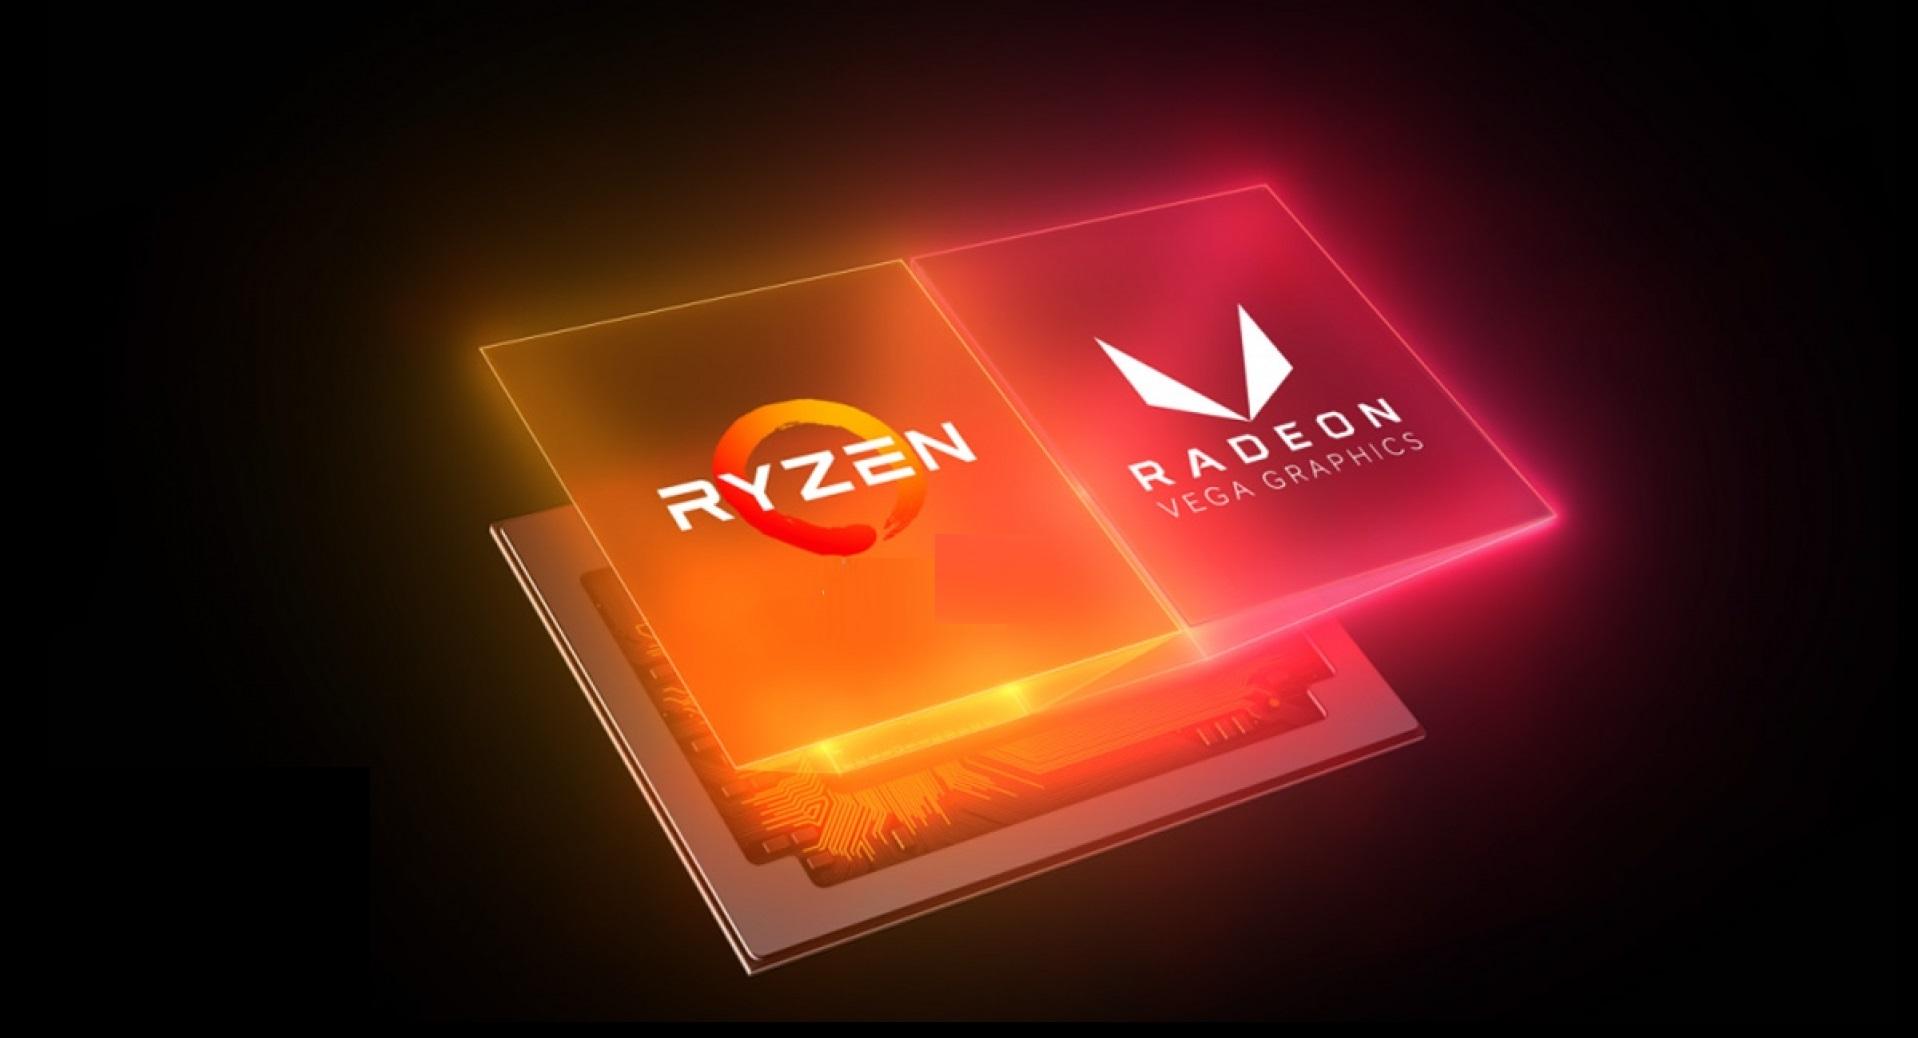 Avvistato il Ryzen 7 4700G con IGPU Vega